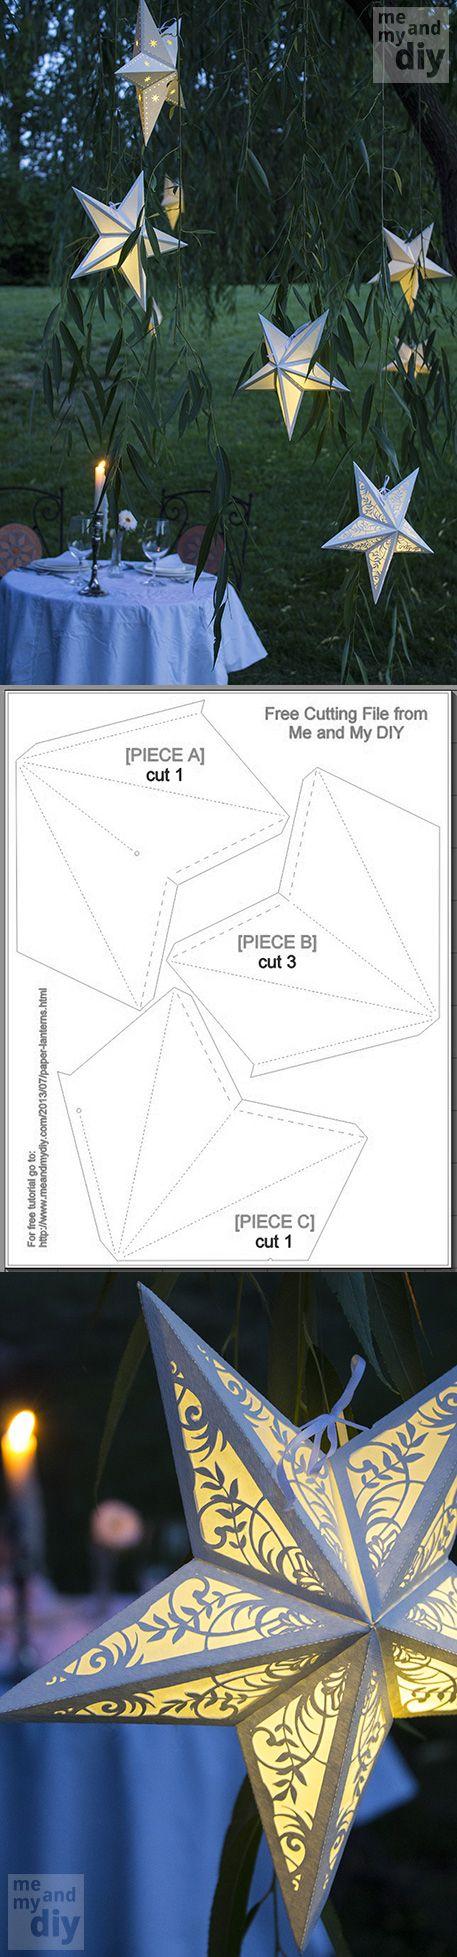 luminaria estrela de papel